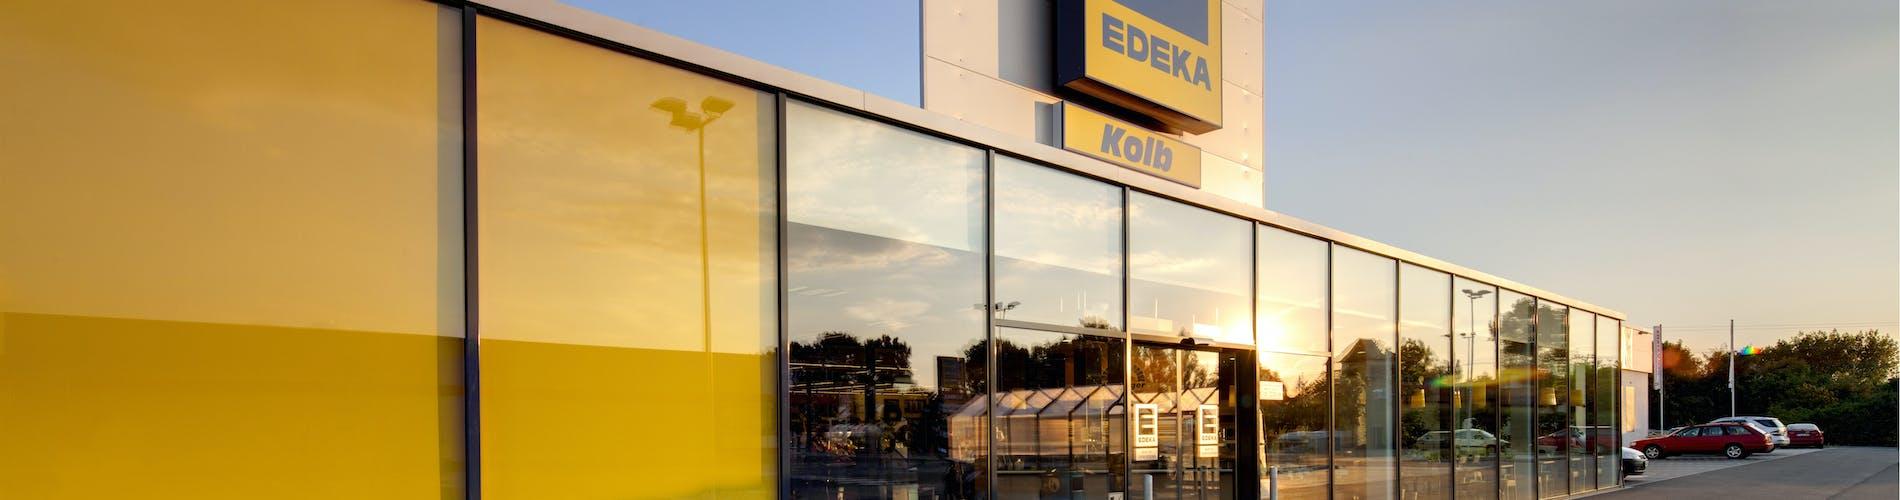 EDEKA store employee app retail